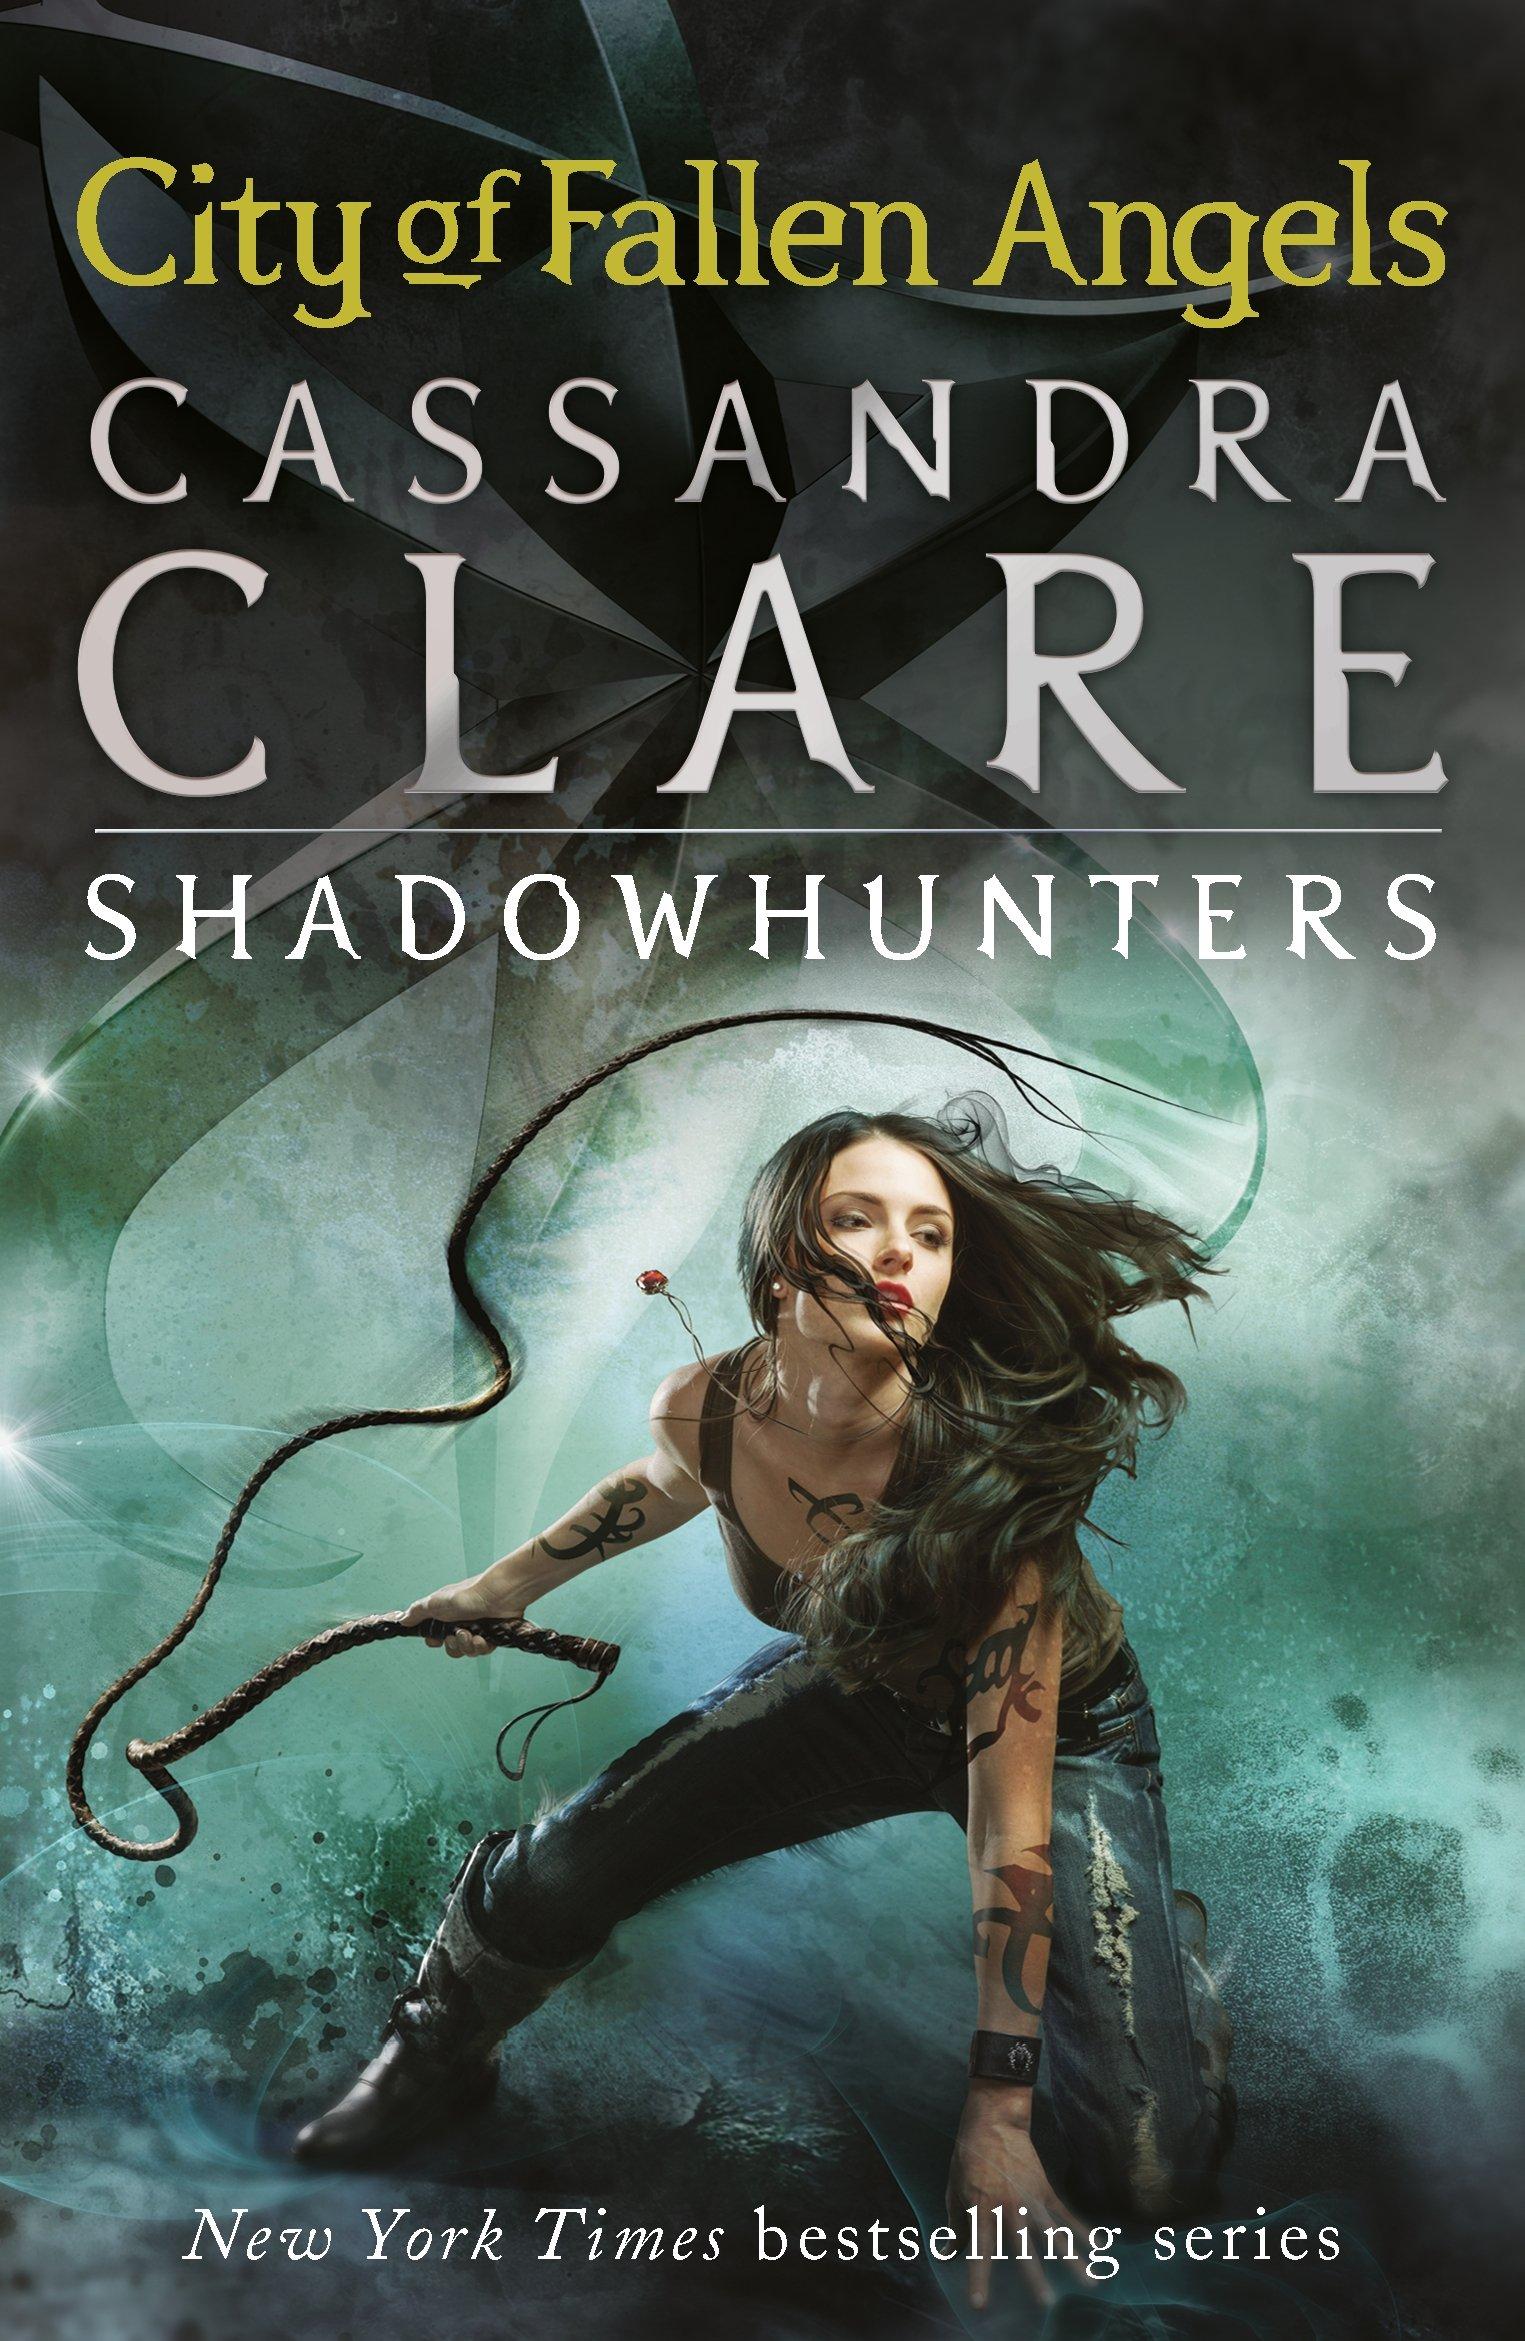 City of Fallen Angels The Mortal Instruments, Book 4: Amazon.co.uk: Clare,  Cassandra: Books